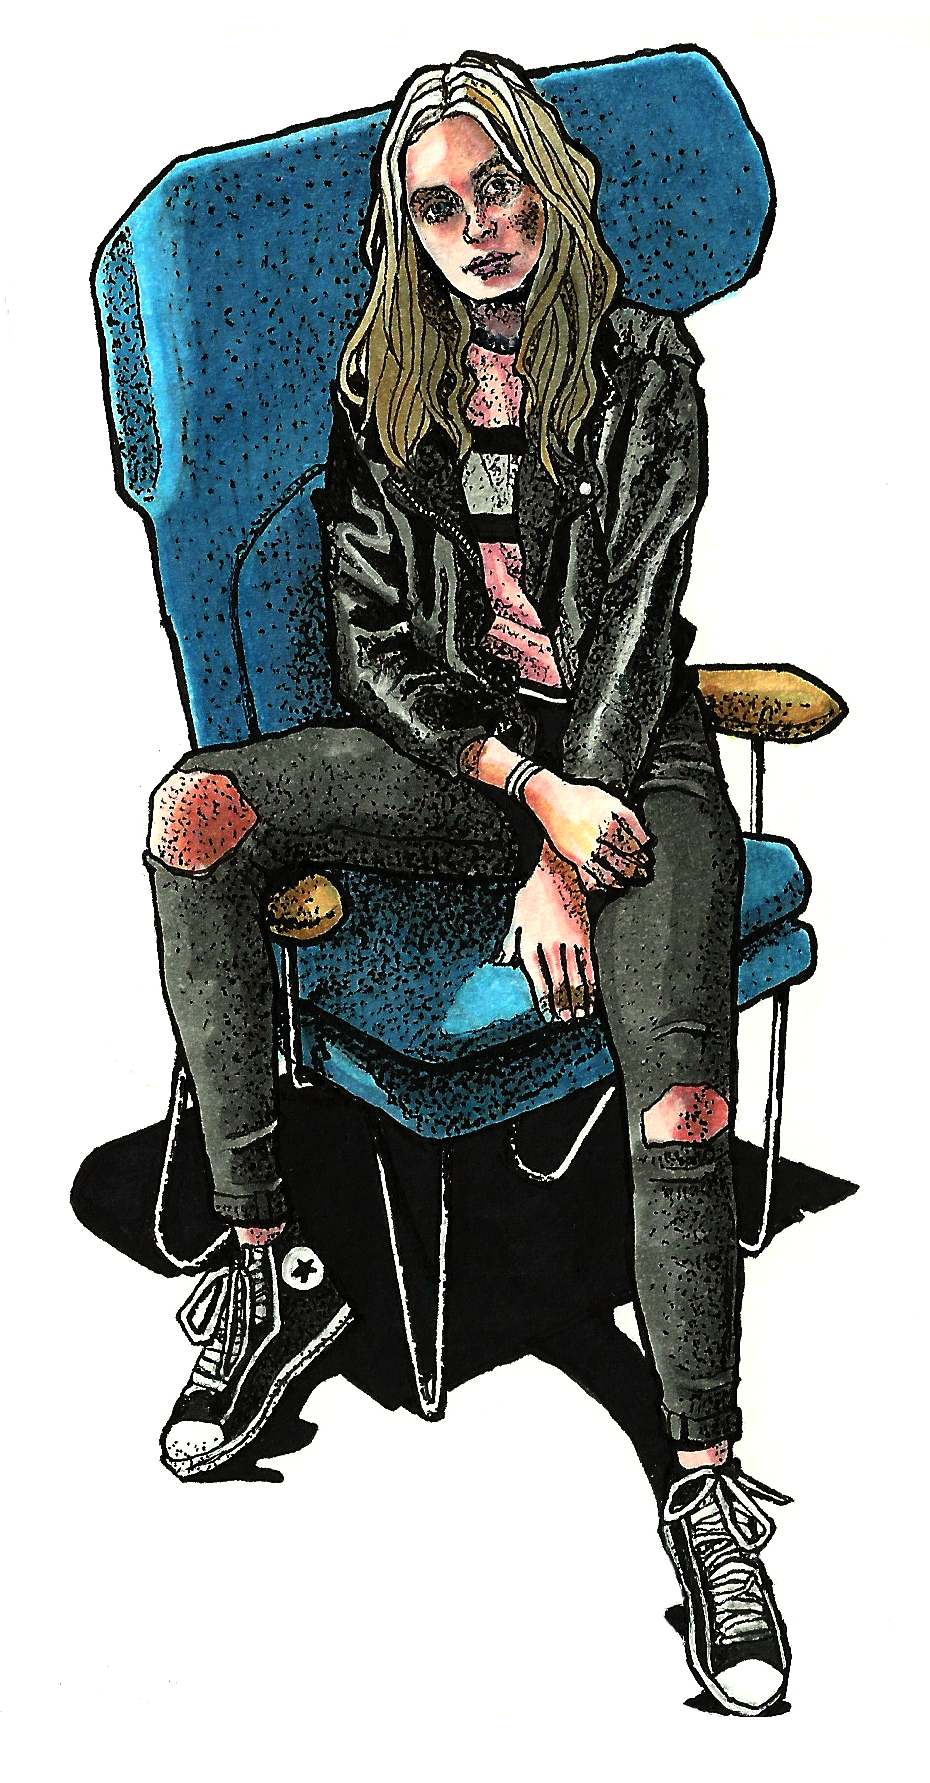 15 sydney (color)